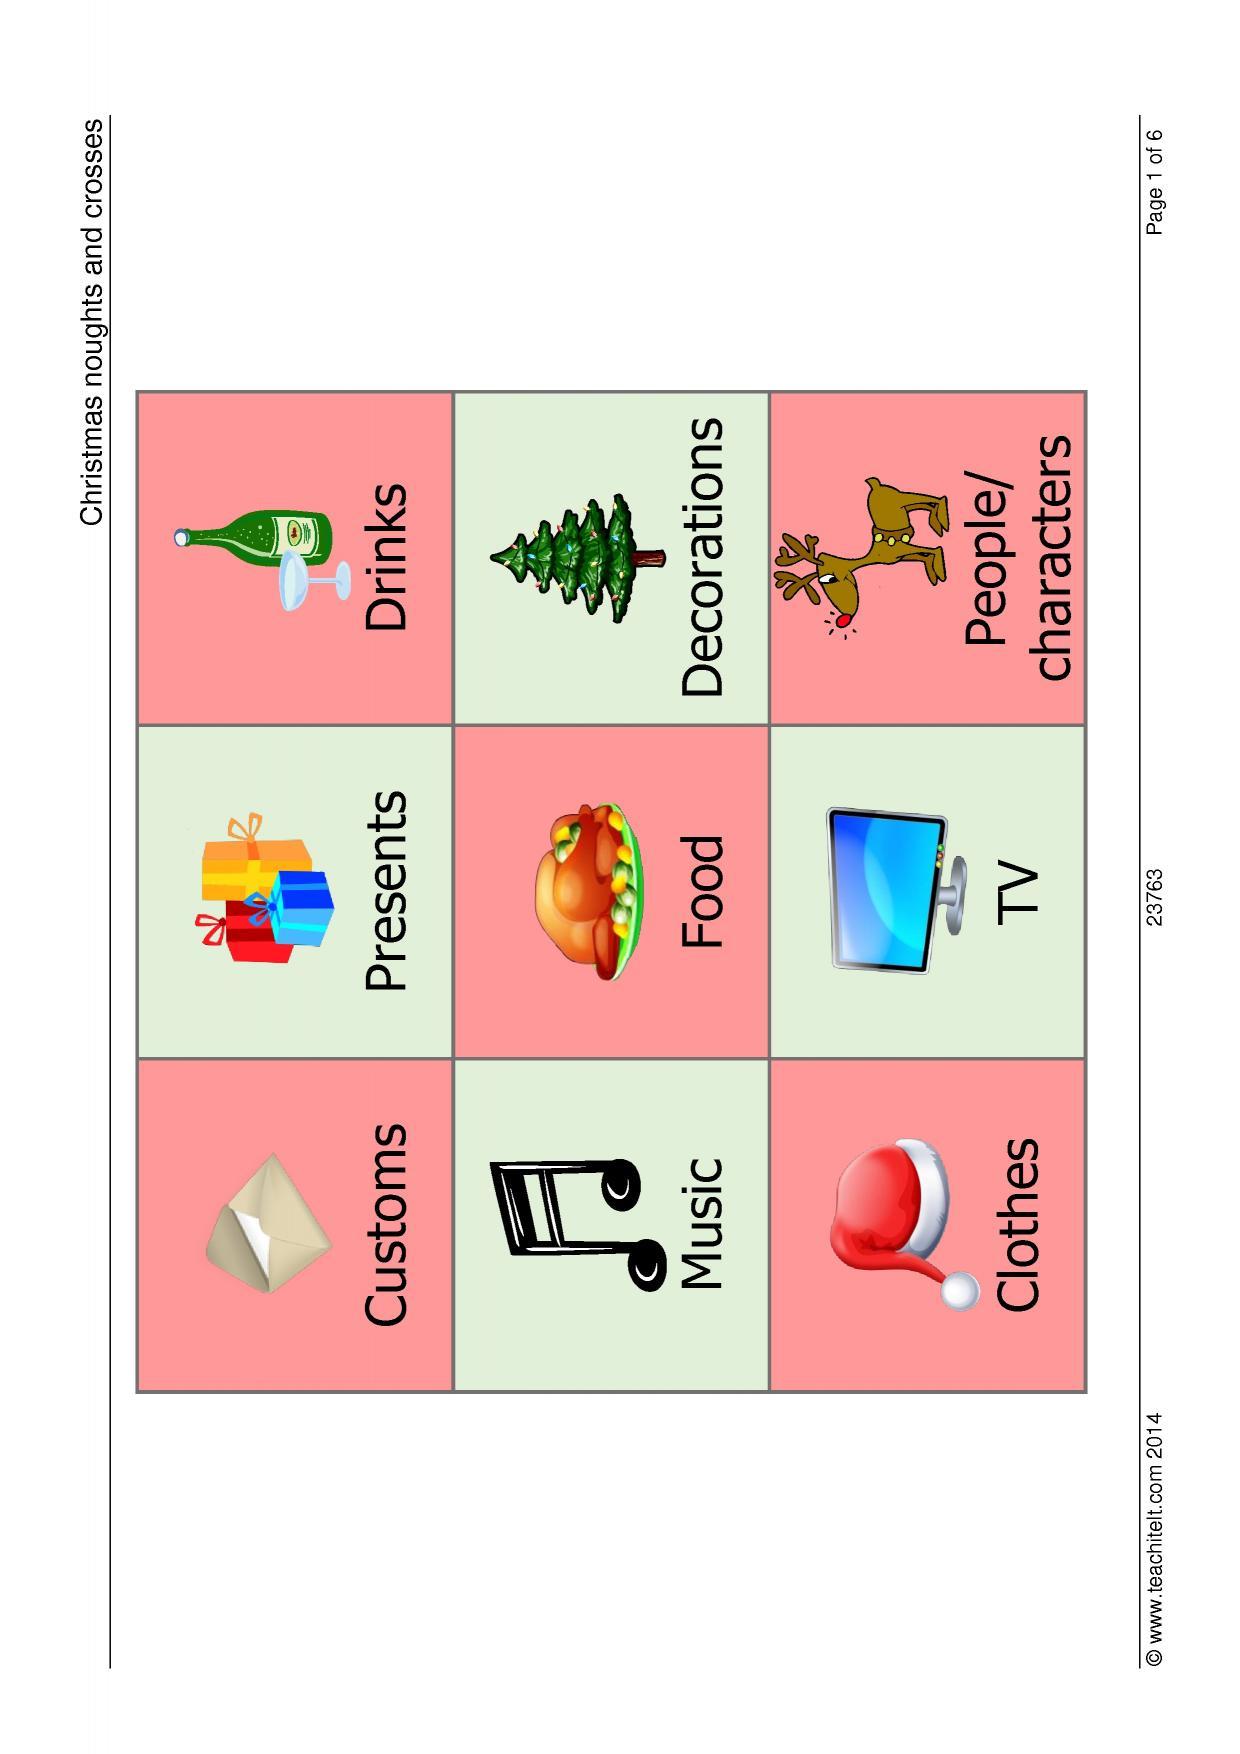 Teachit ELT ELT resources - C1 advanced vocabulary resources